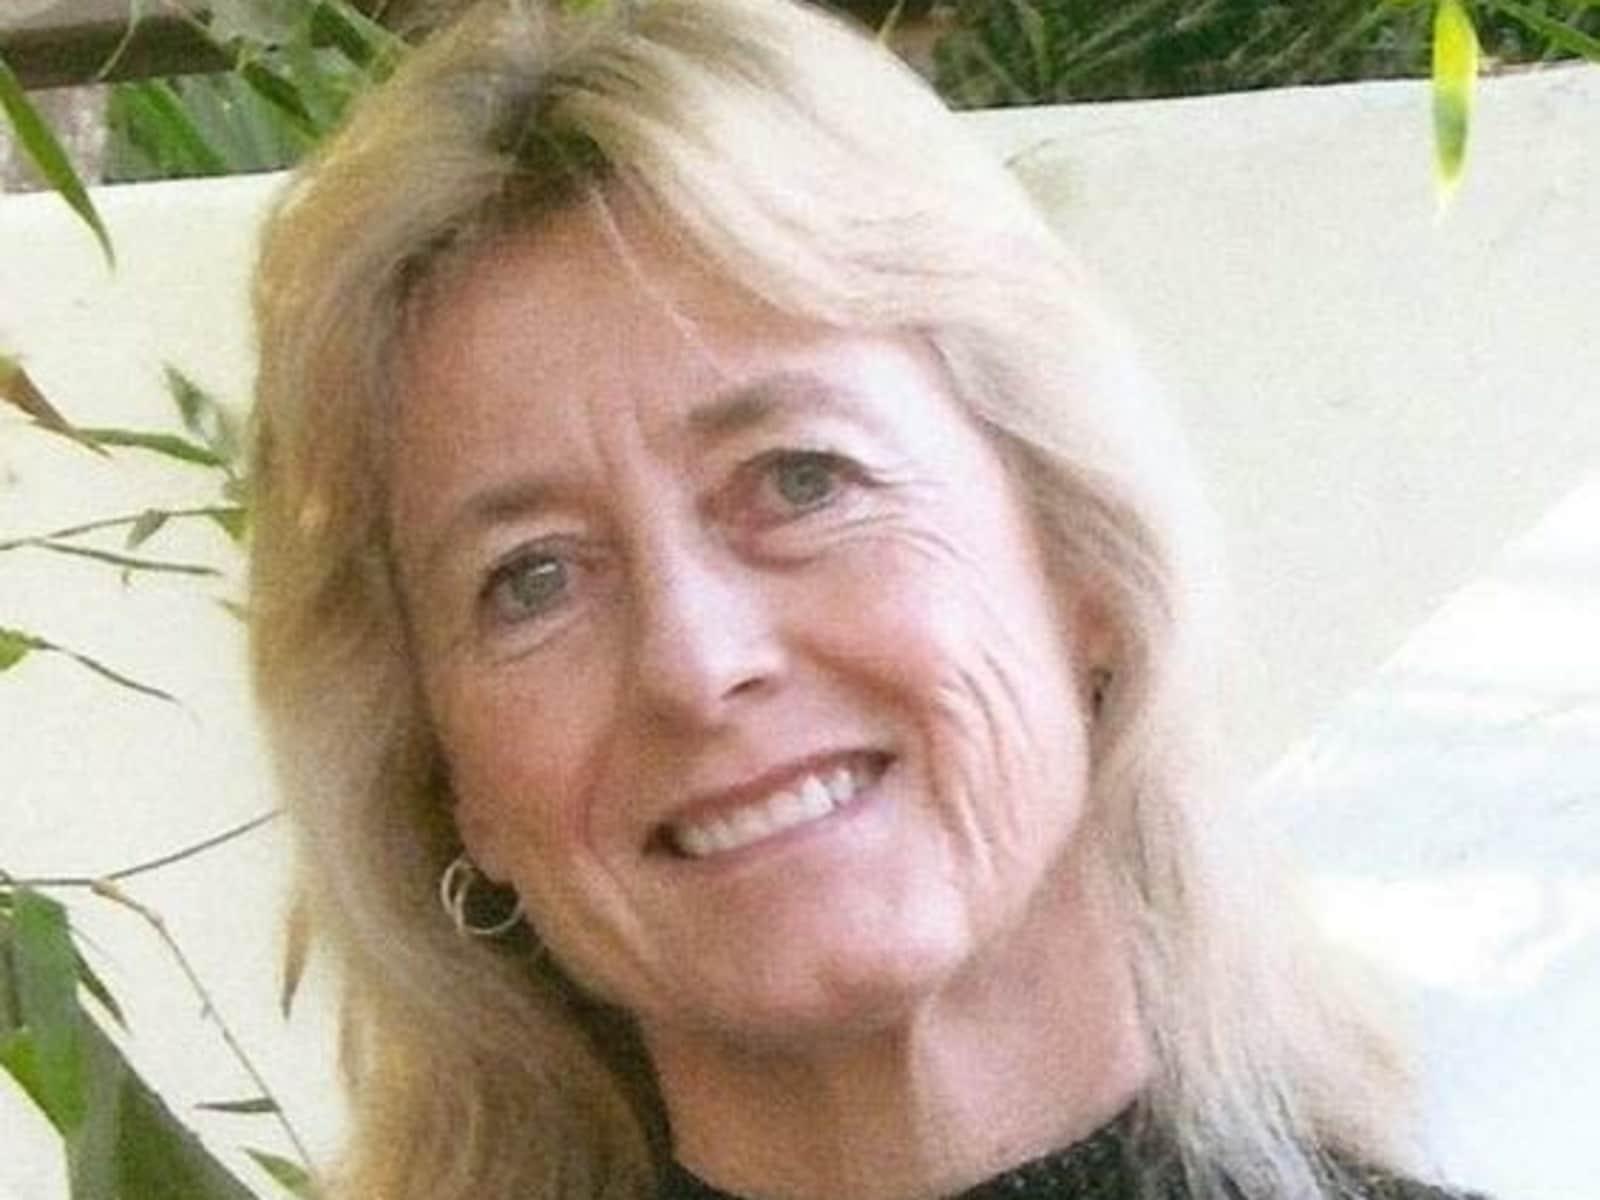 Jill from Oceanside, California, United States